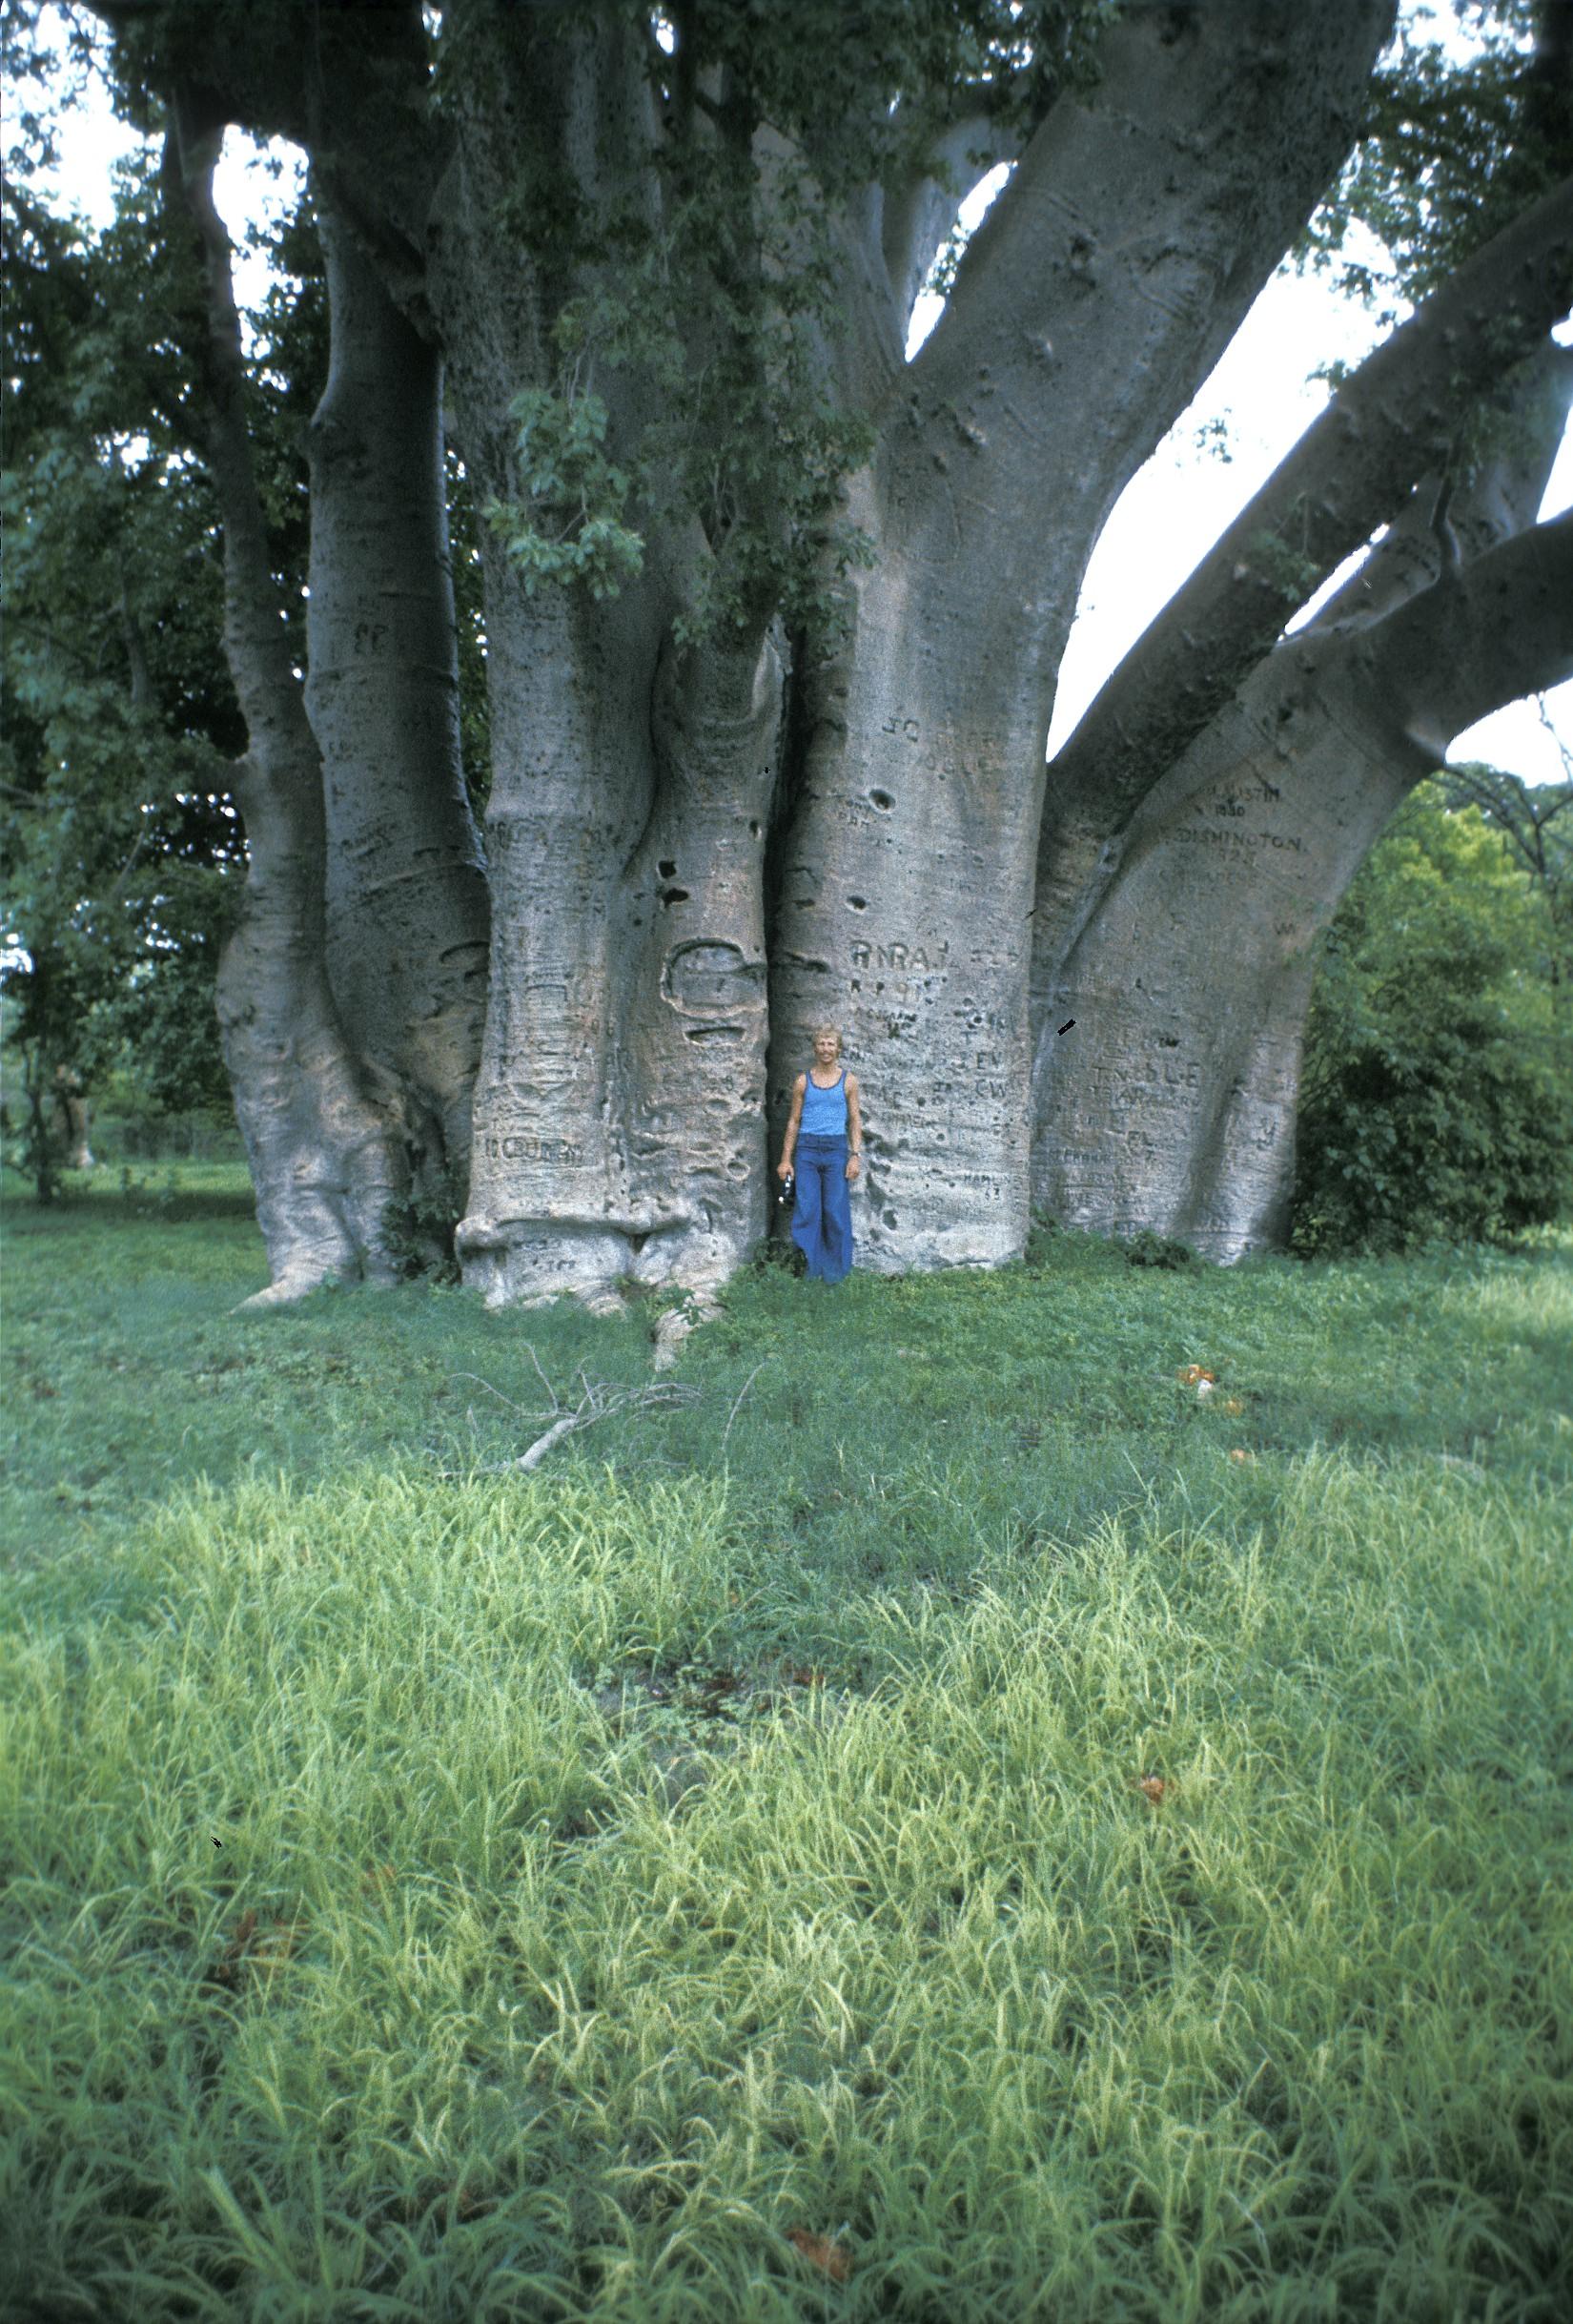 My friend Jeff under the Baobab tree.